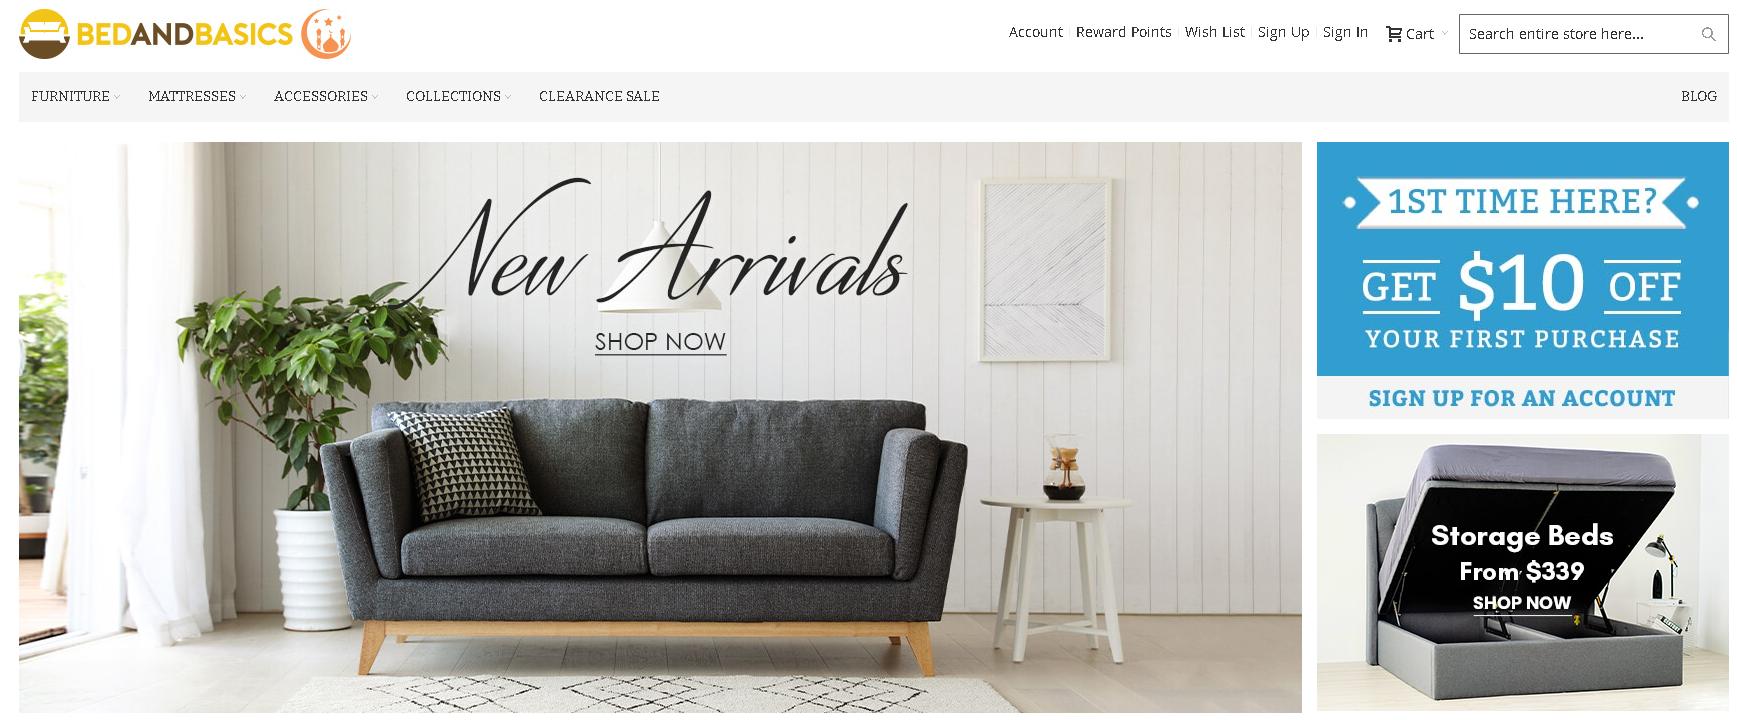 Where to buy furniture online in Singapore - Bedandbasics